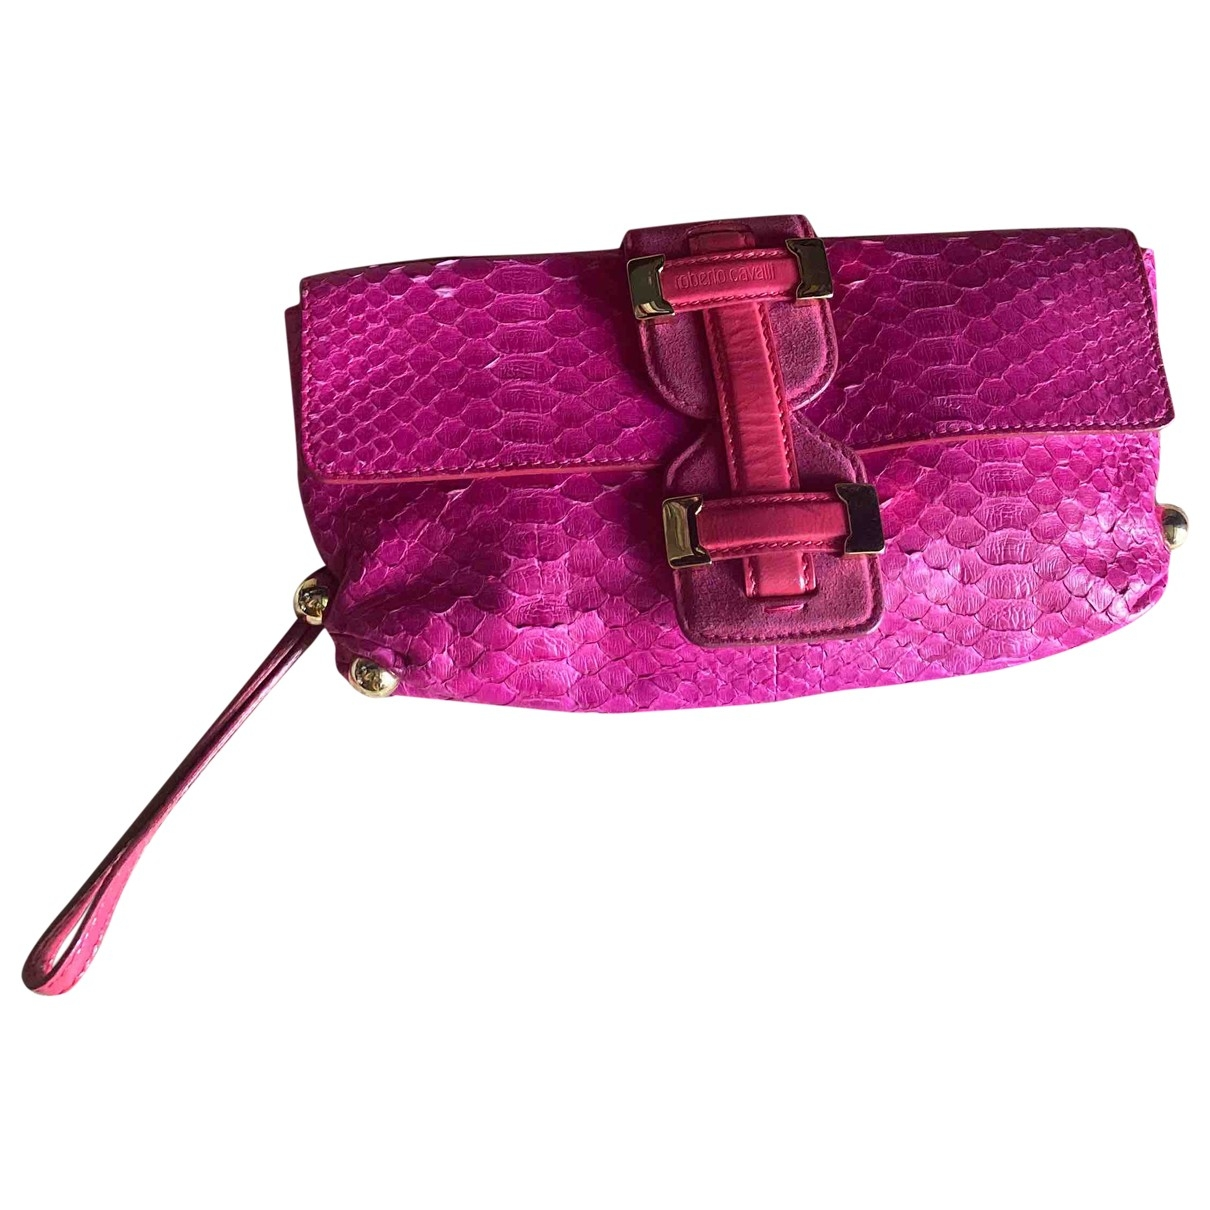 Roberto Cavalli \N Red Python Clutch bag for Women \N